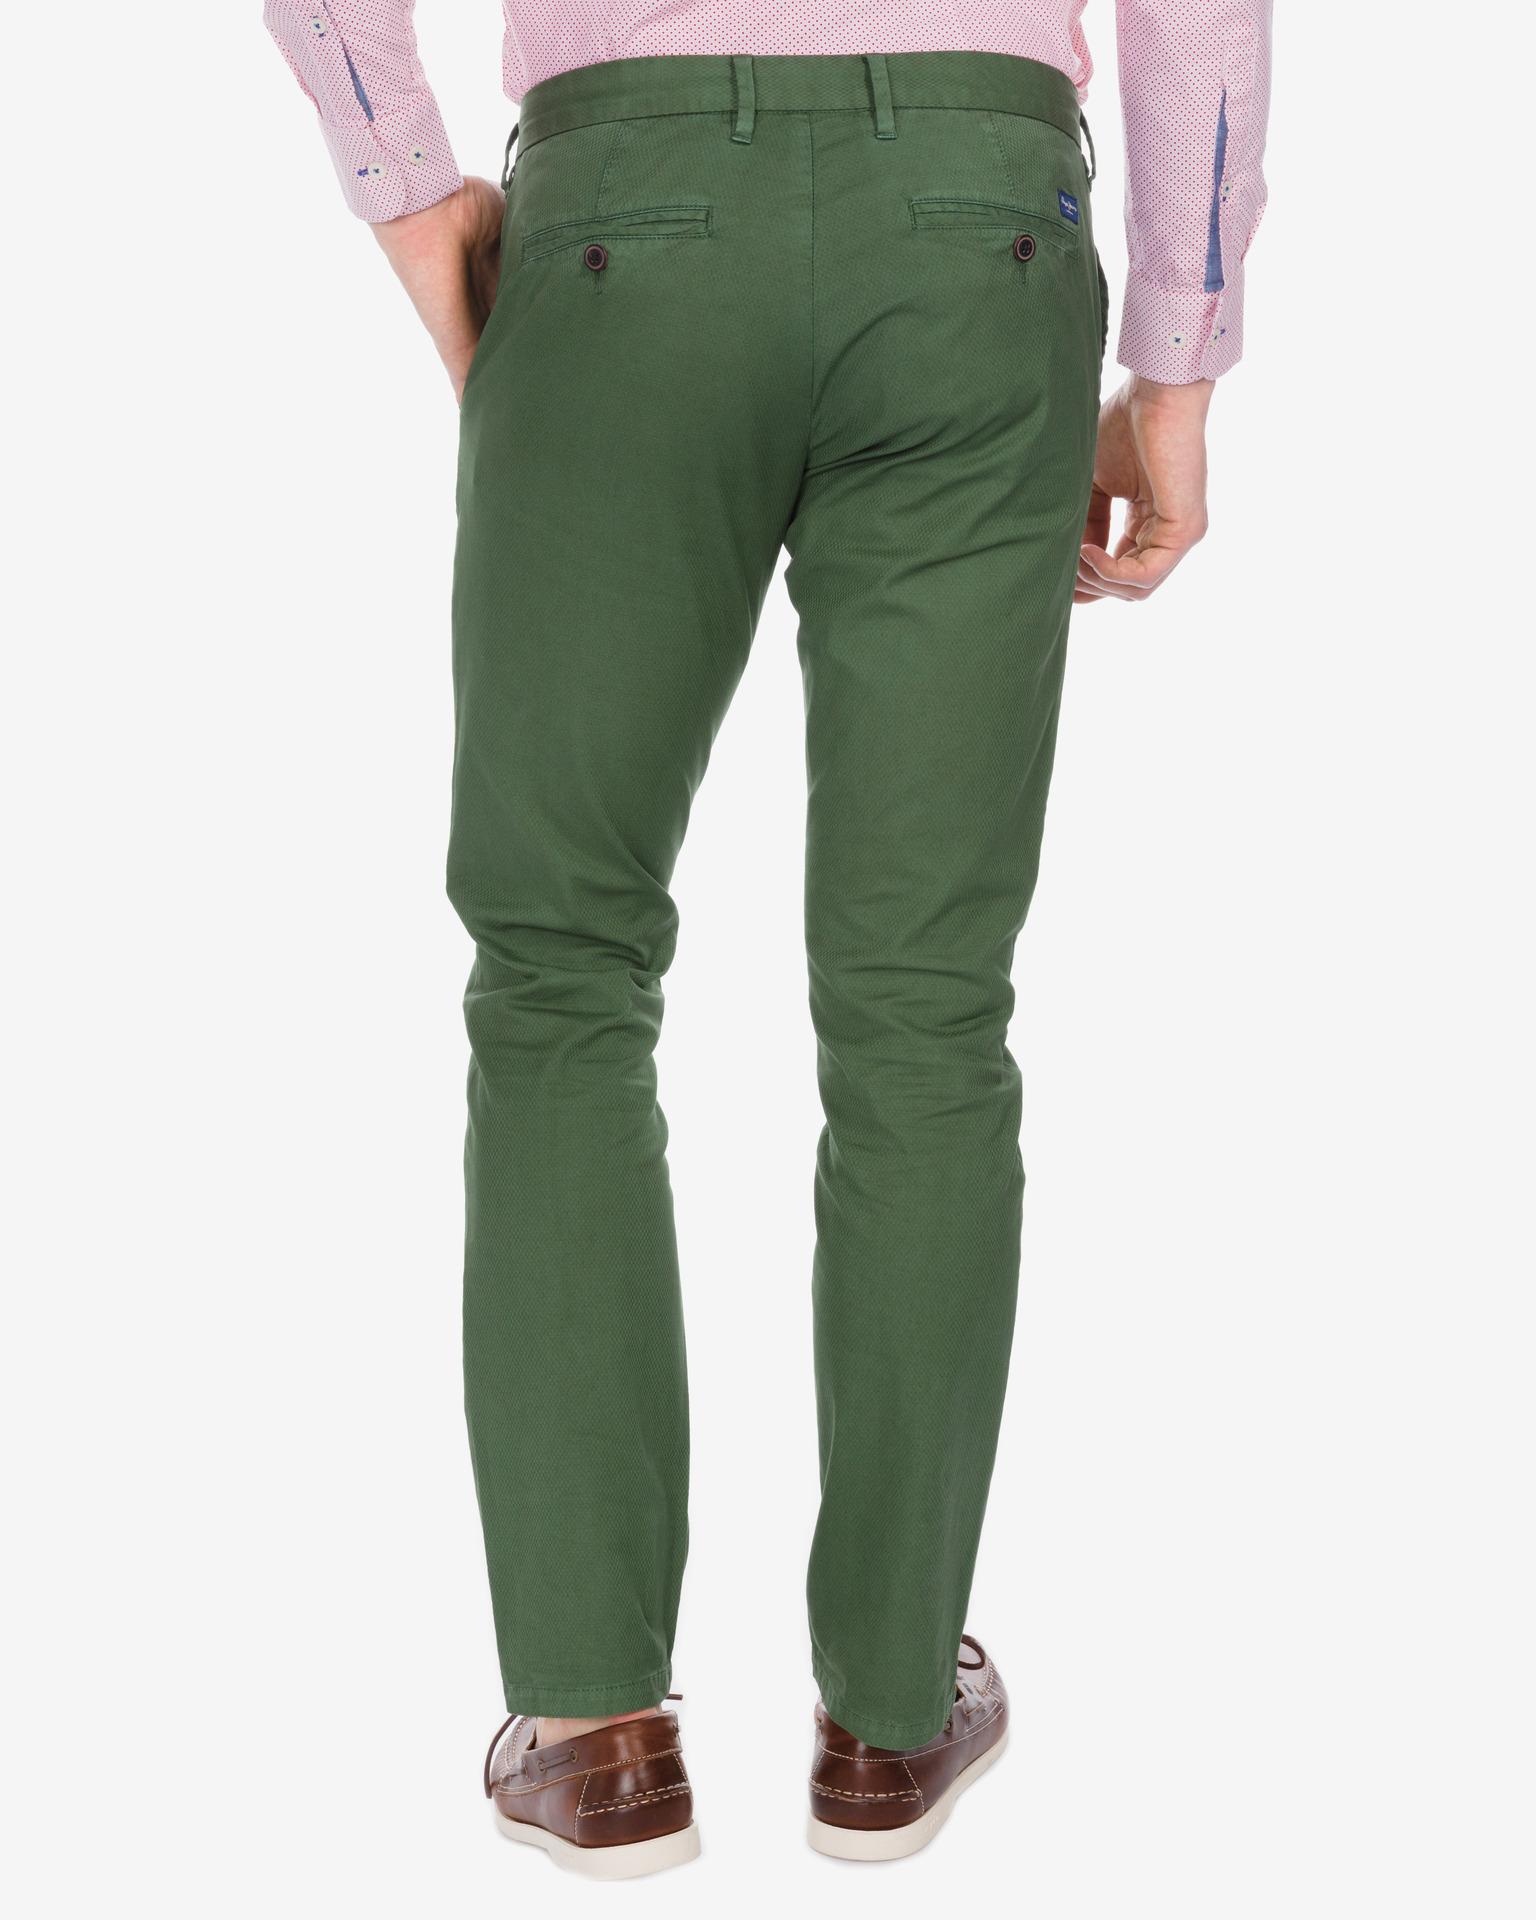 Pepe jeans hose grun